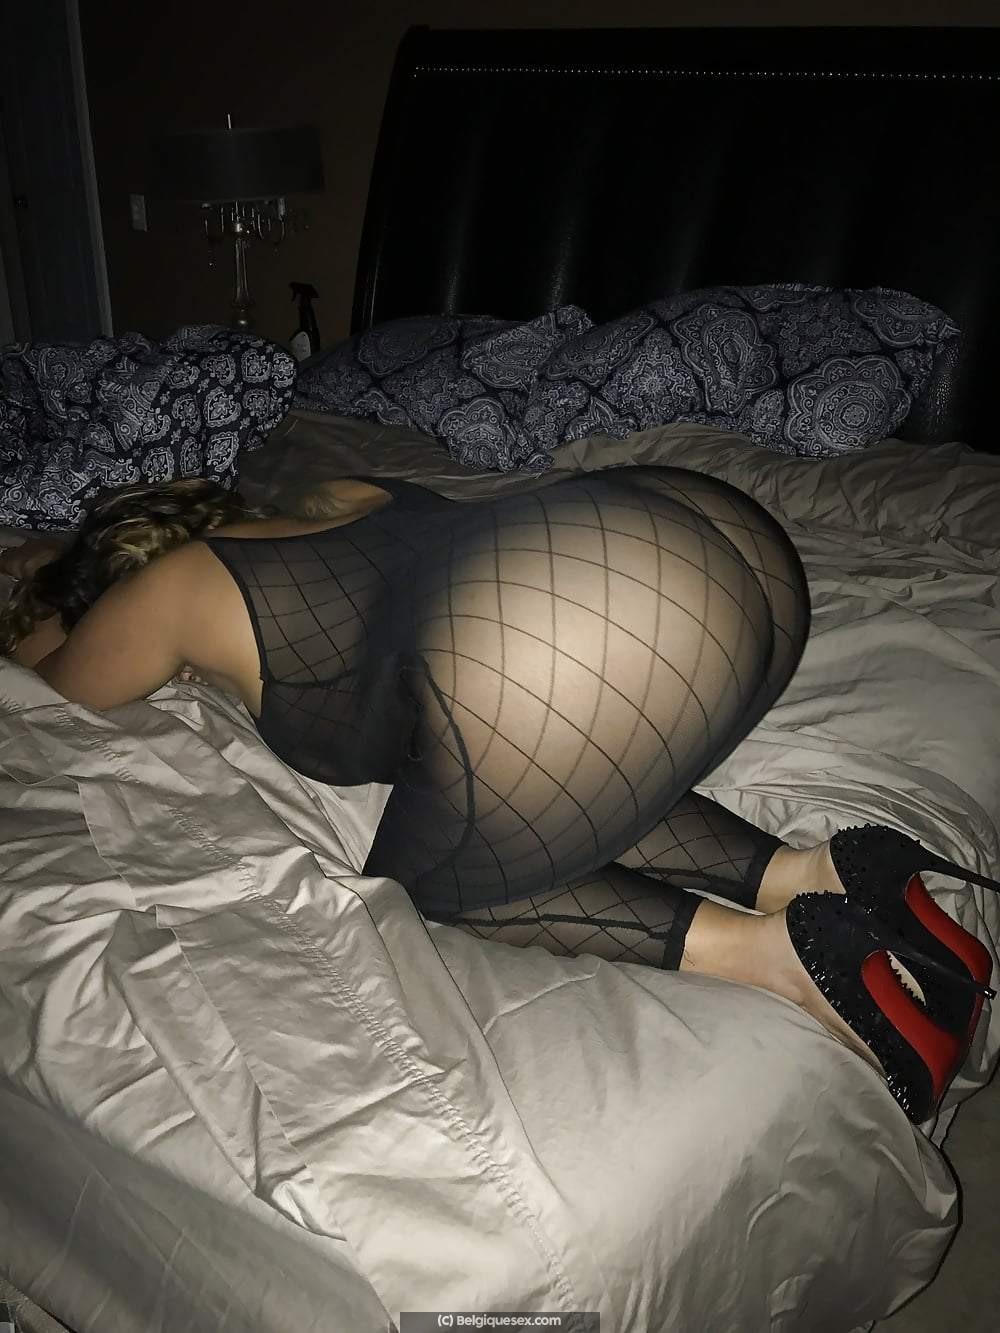 Soirée BDSM a Hoogstraten (2 soumises dispos)